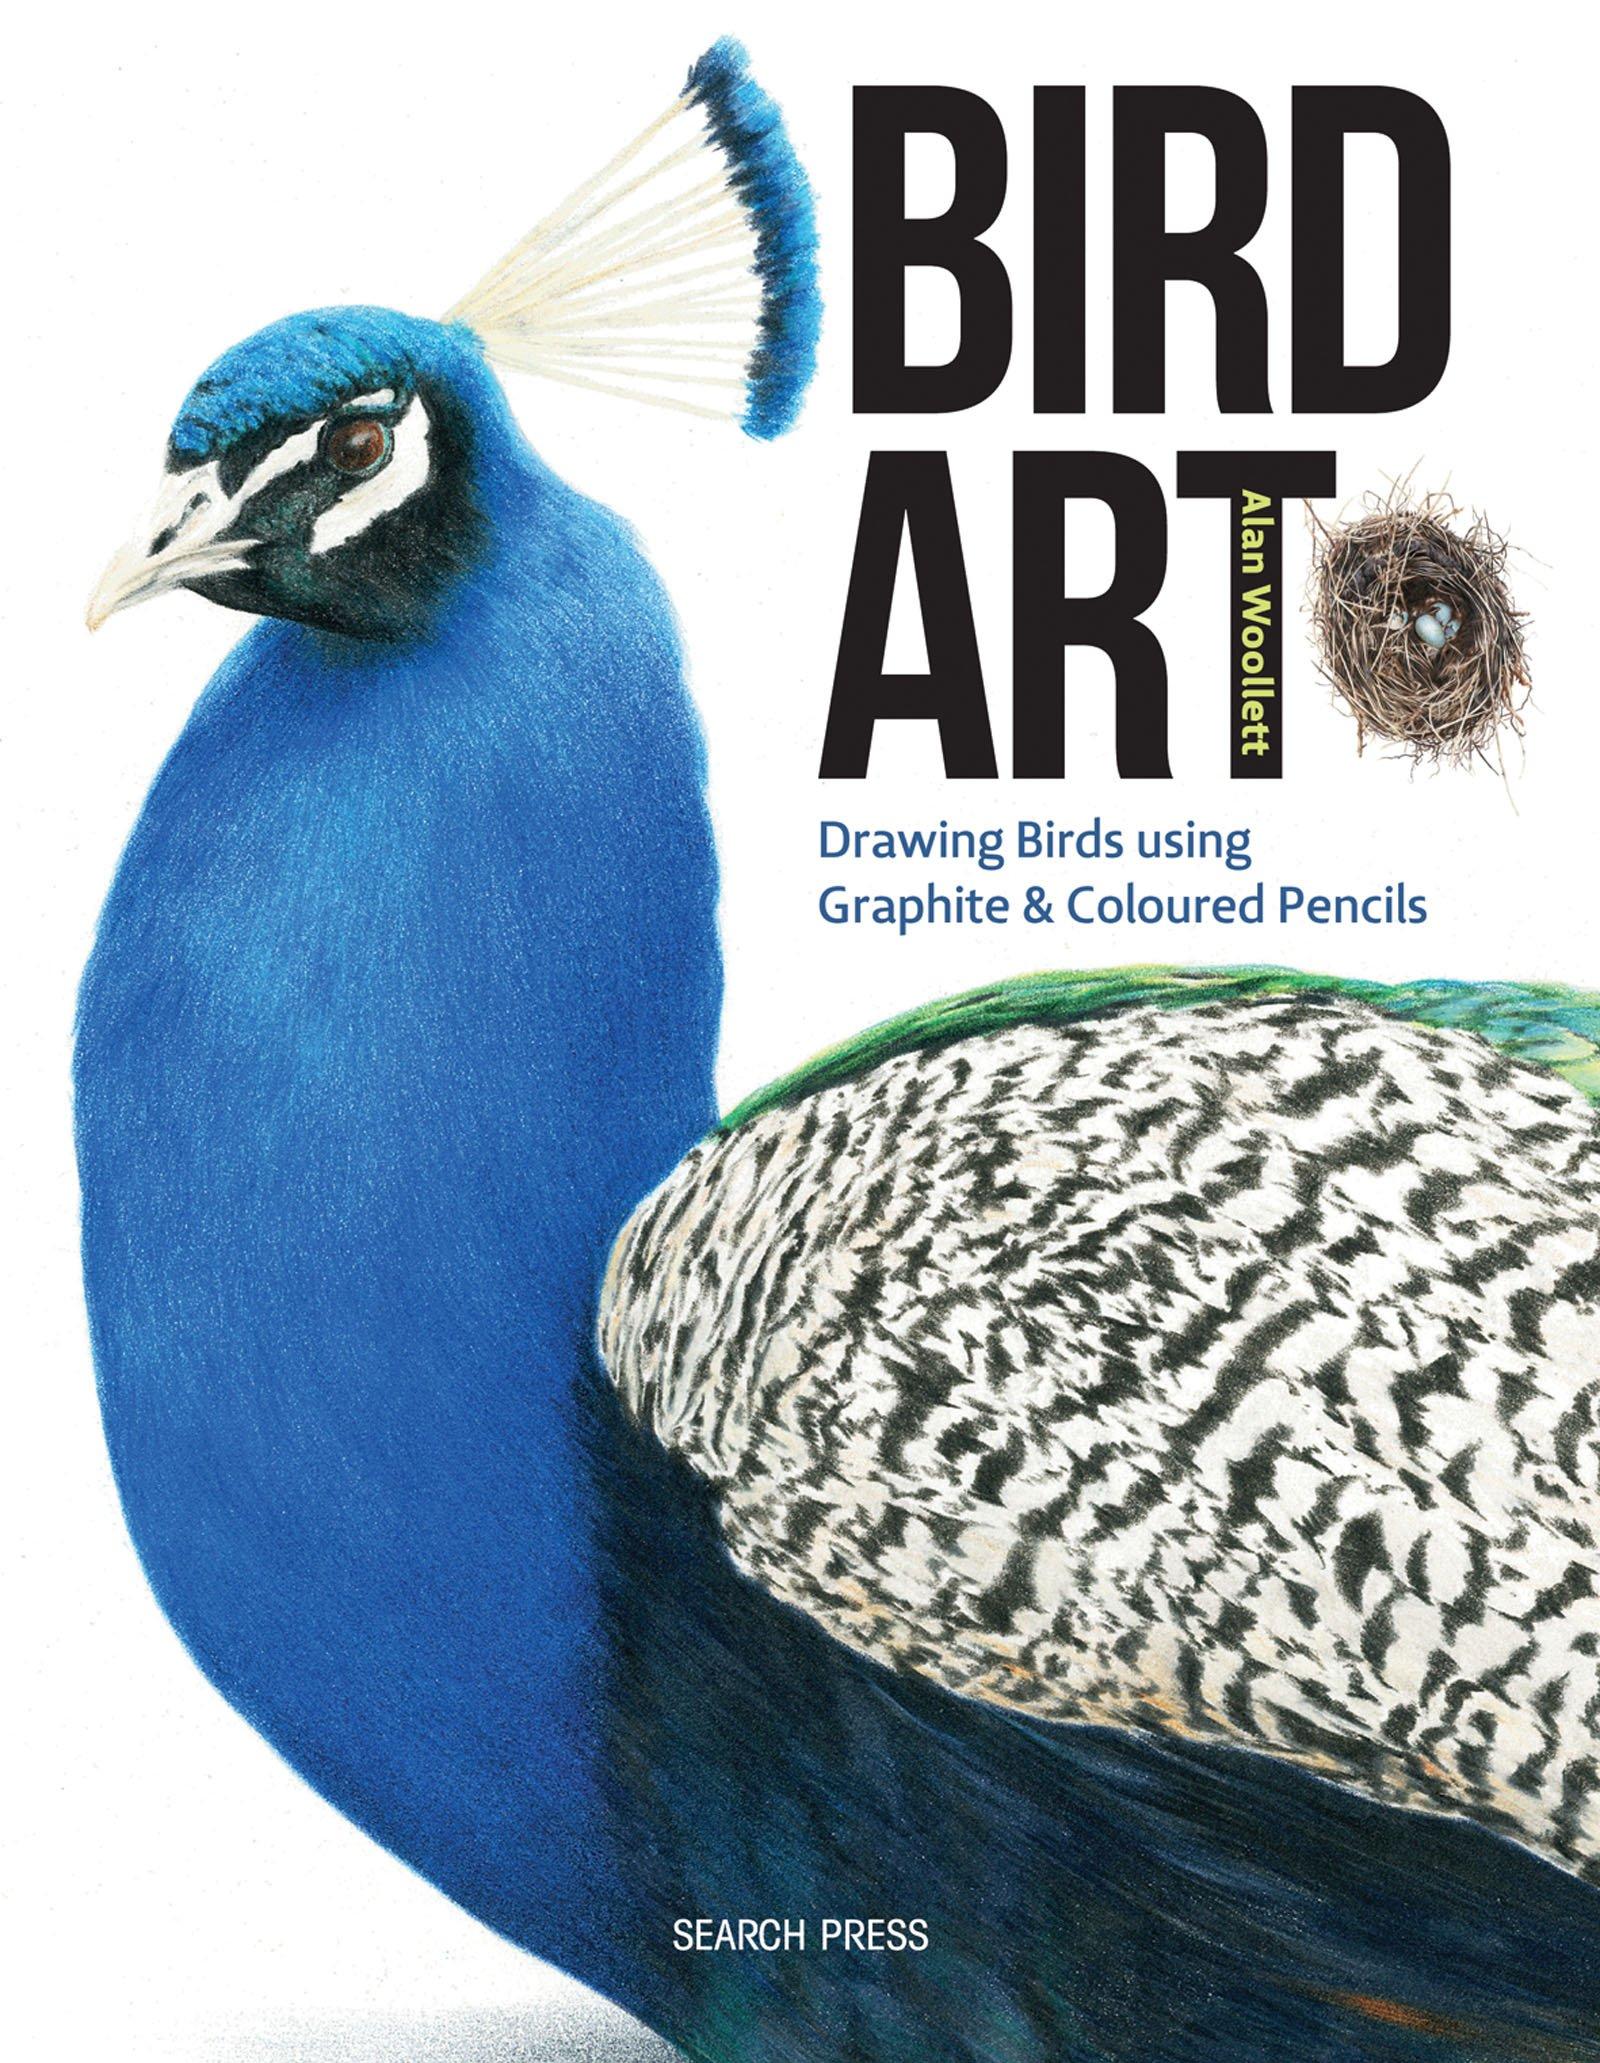 Bird Art Graphite Coloured Pencils product image